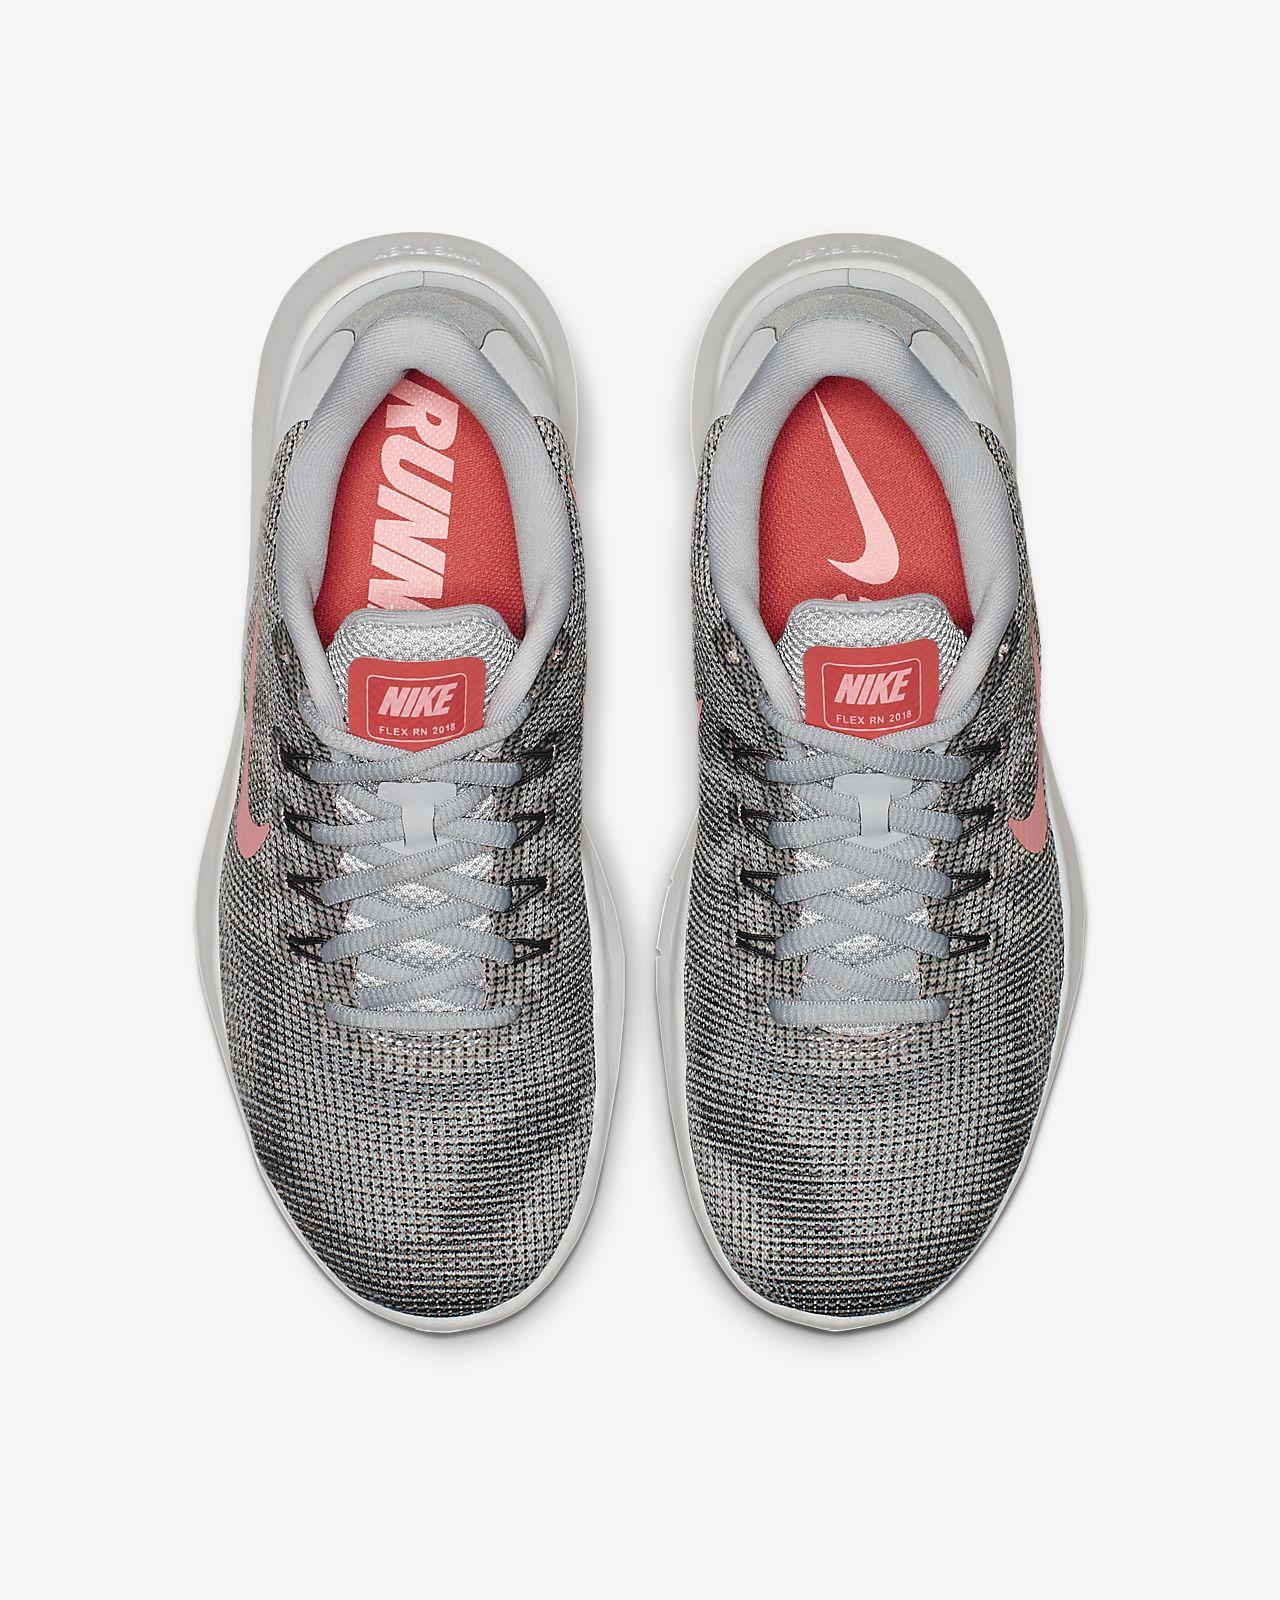 pretty nice cff97 07b16 Womens Rn Lu Shoe Running 2018 Nike Flex qtx0P4tz